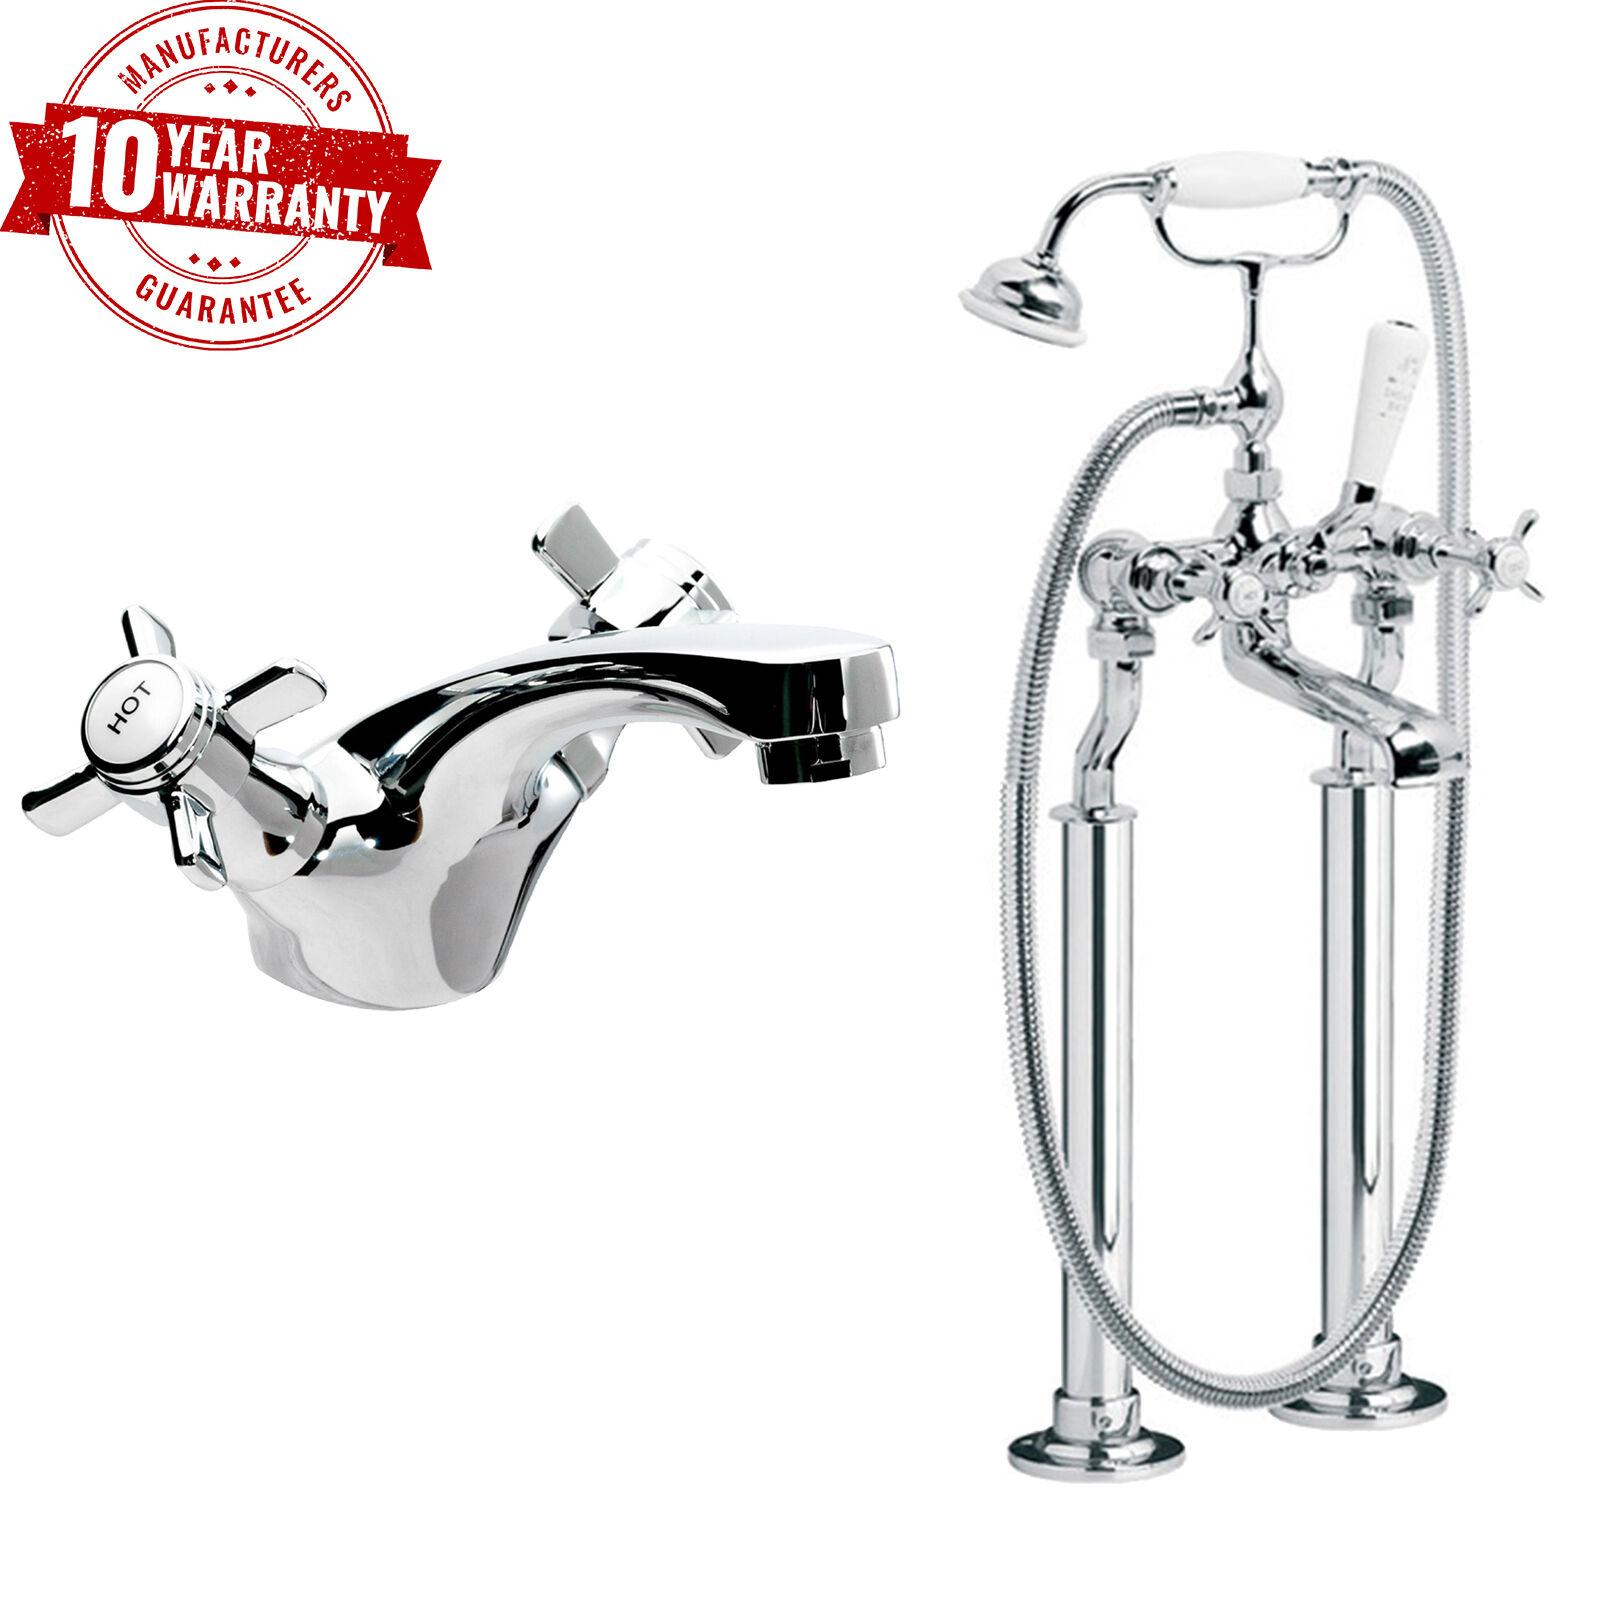 Traditional baignoir bain douche mélangeur & bassin robinet cross poignée manivelle jambes